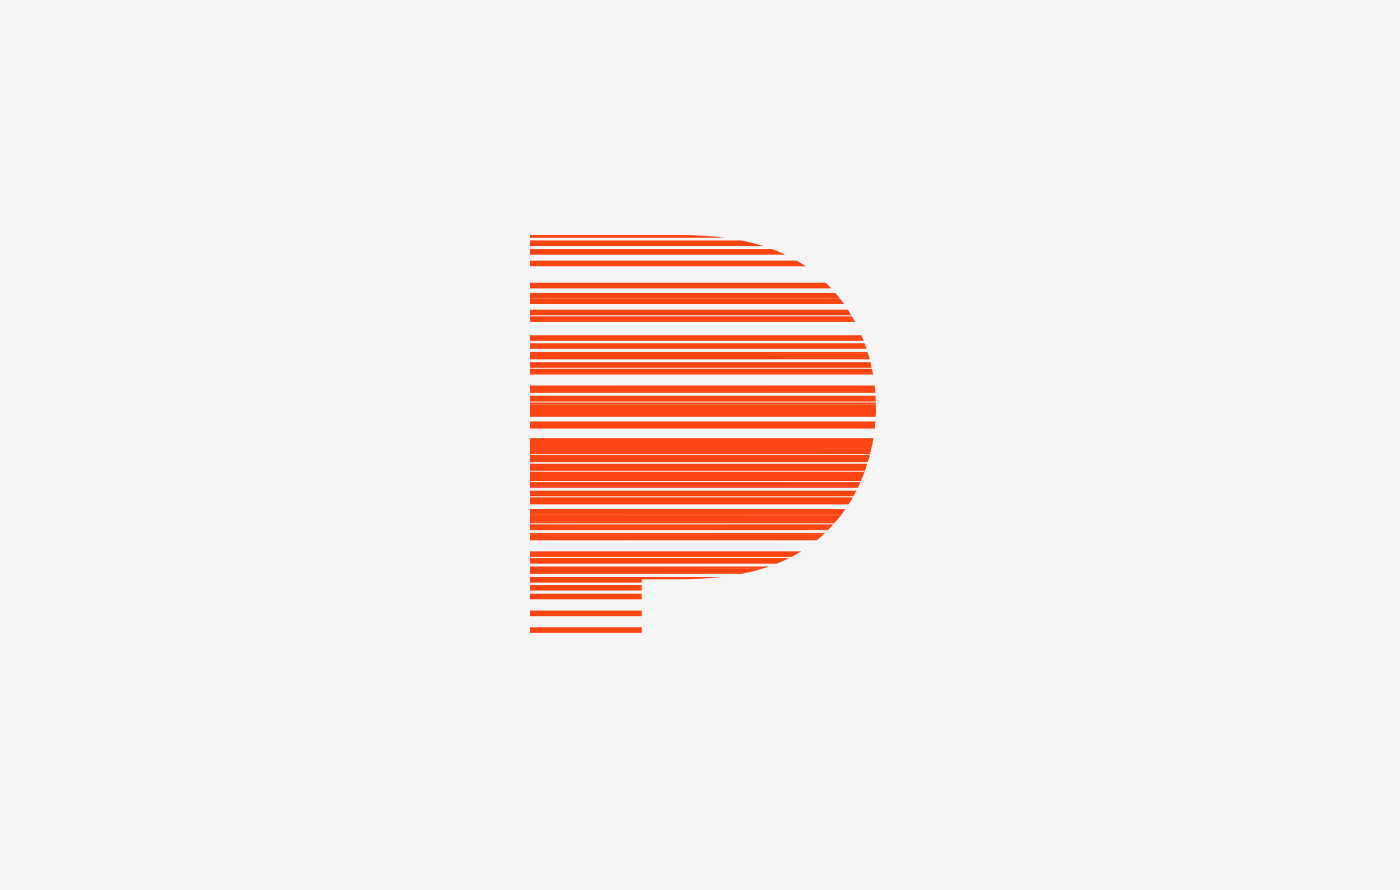 Proenergy - Energy provider